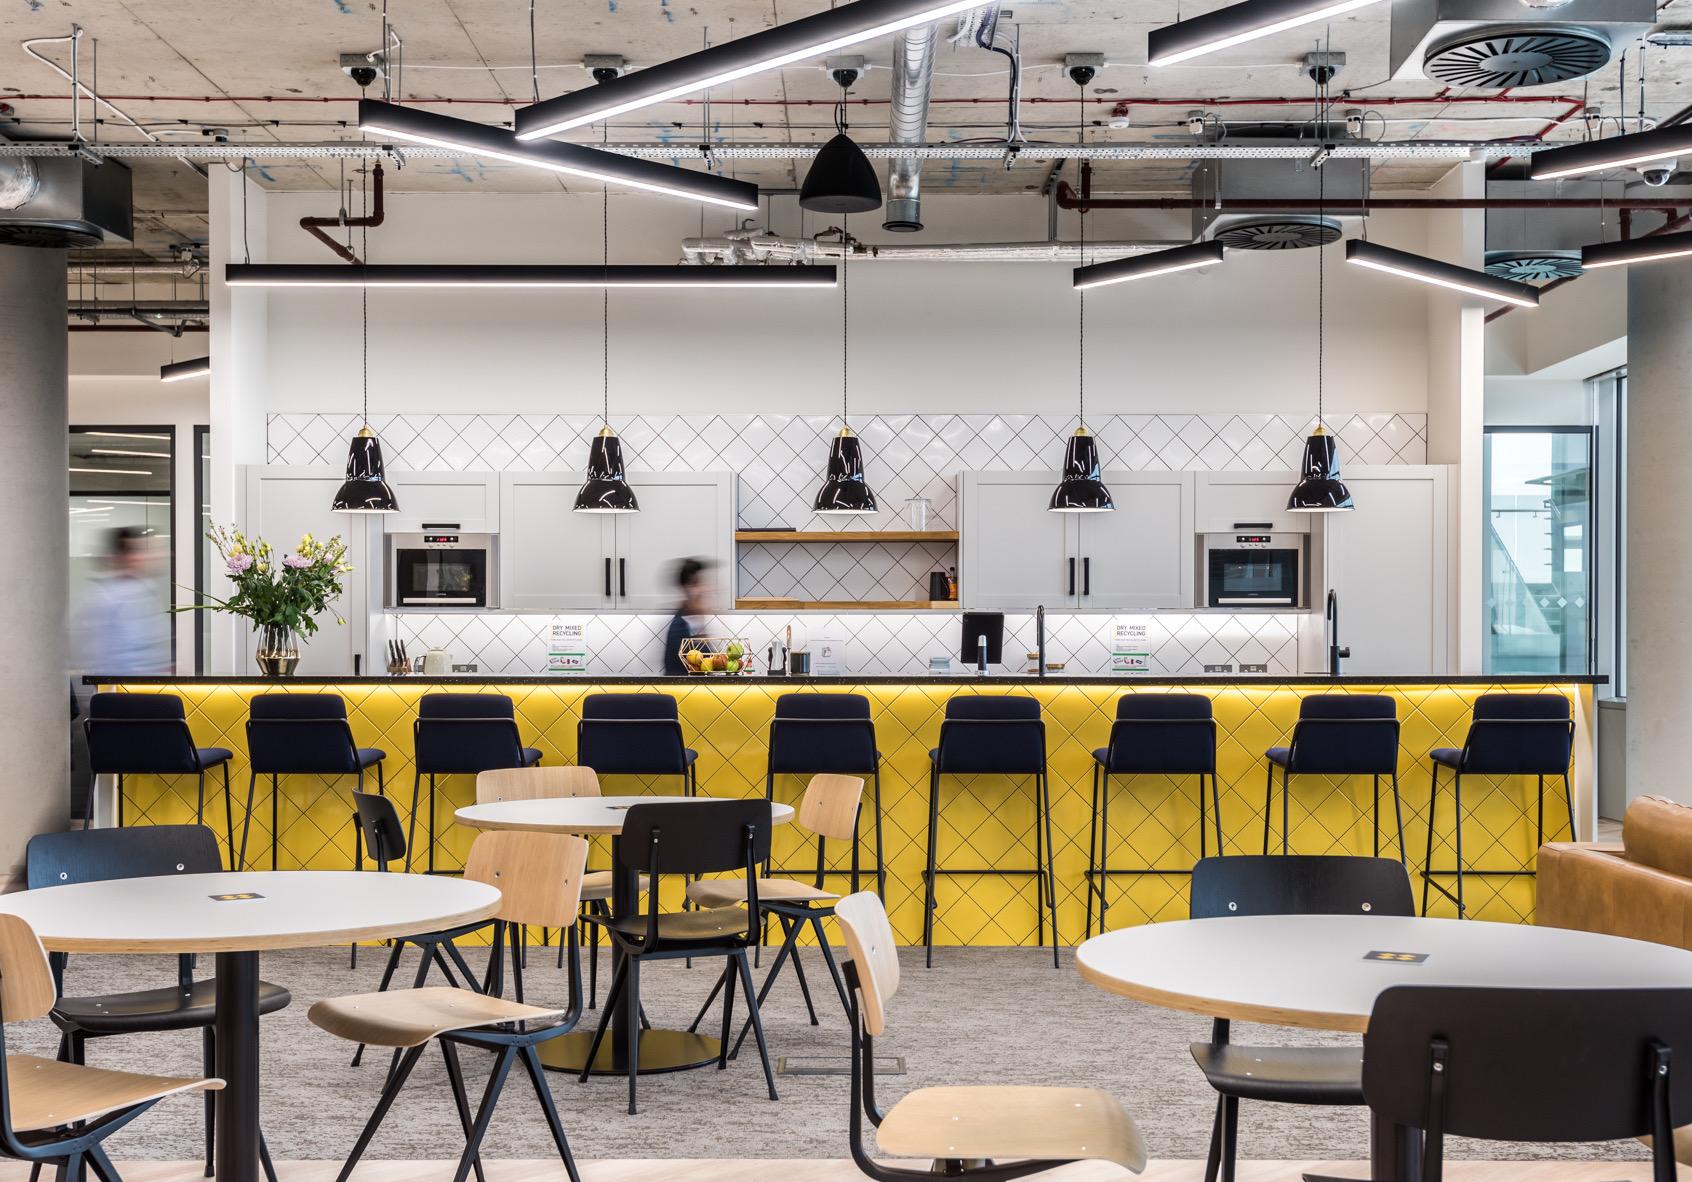 venture-x-london-coworking-space-15